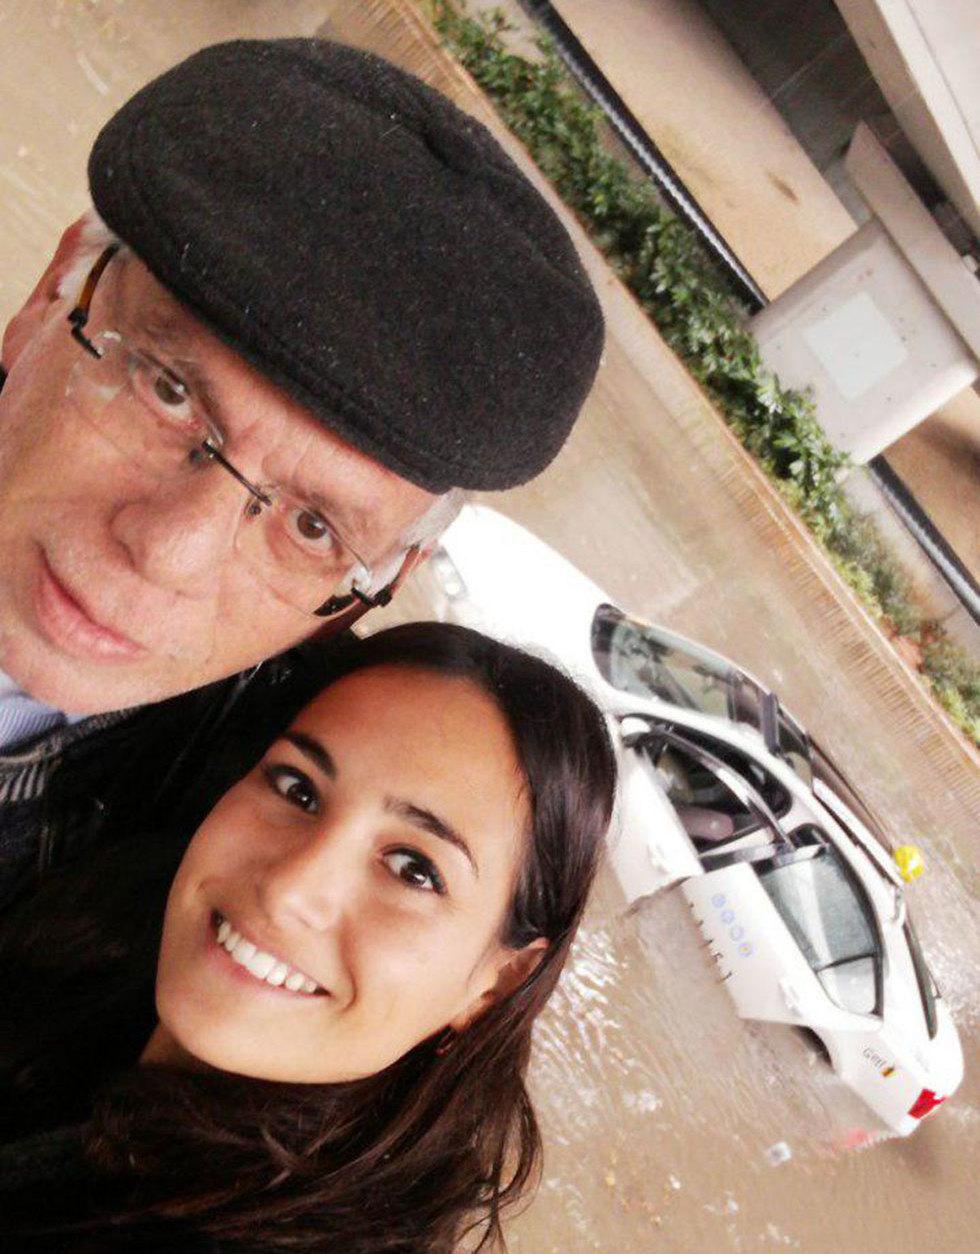 Avital Parmot and the cab driver (Photo: Avital Parmot)